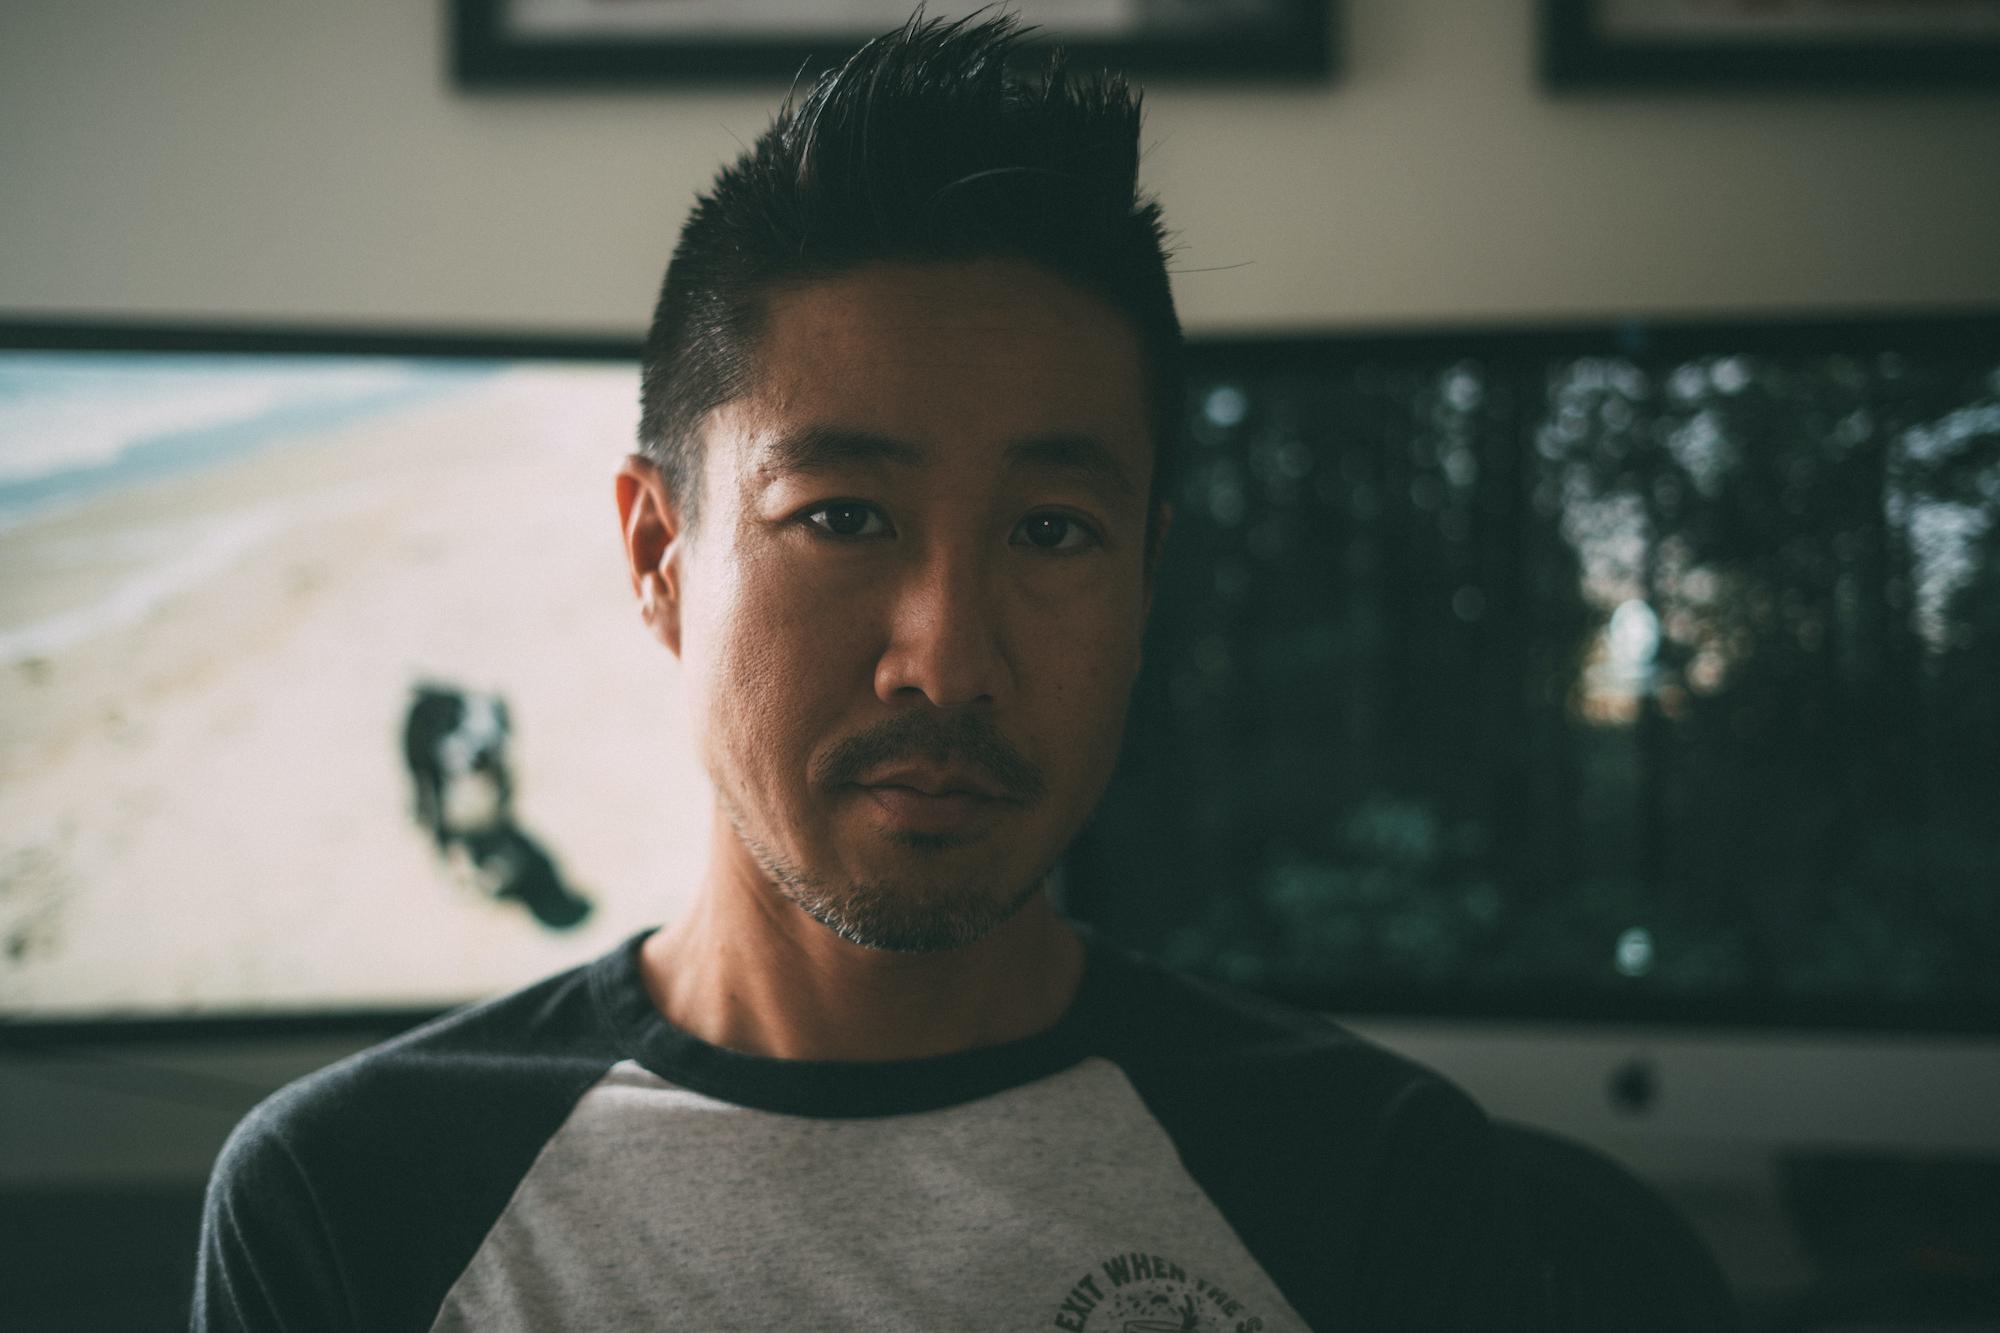 Takashi Takeoka headshot